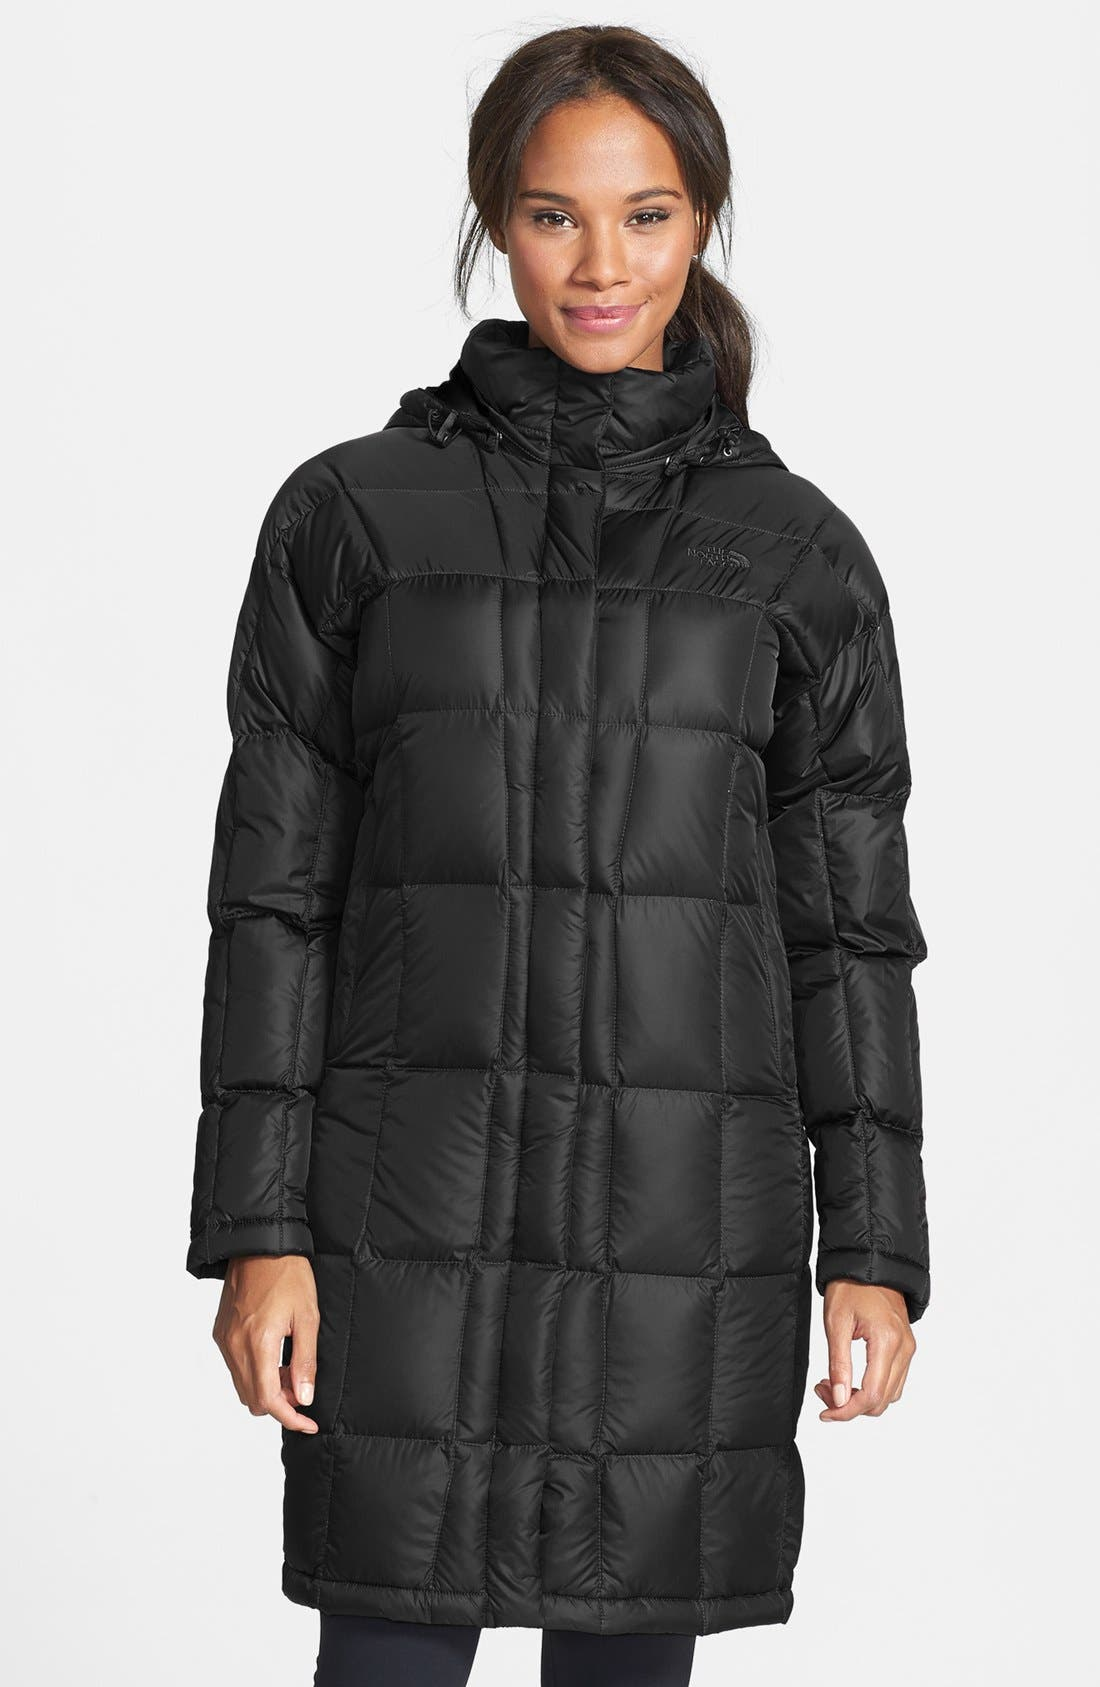 north face ladies parka jacket